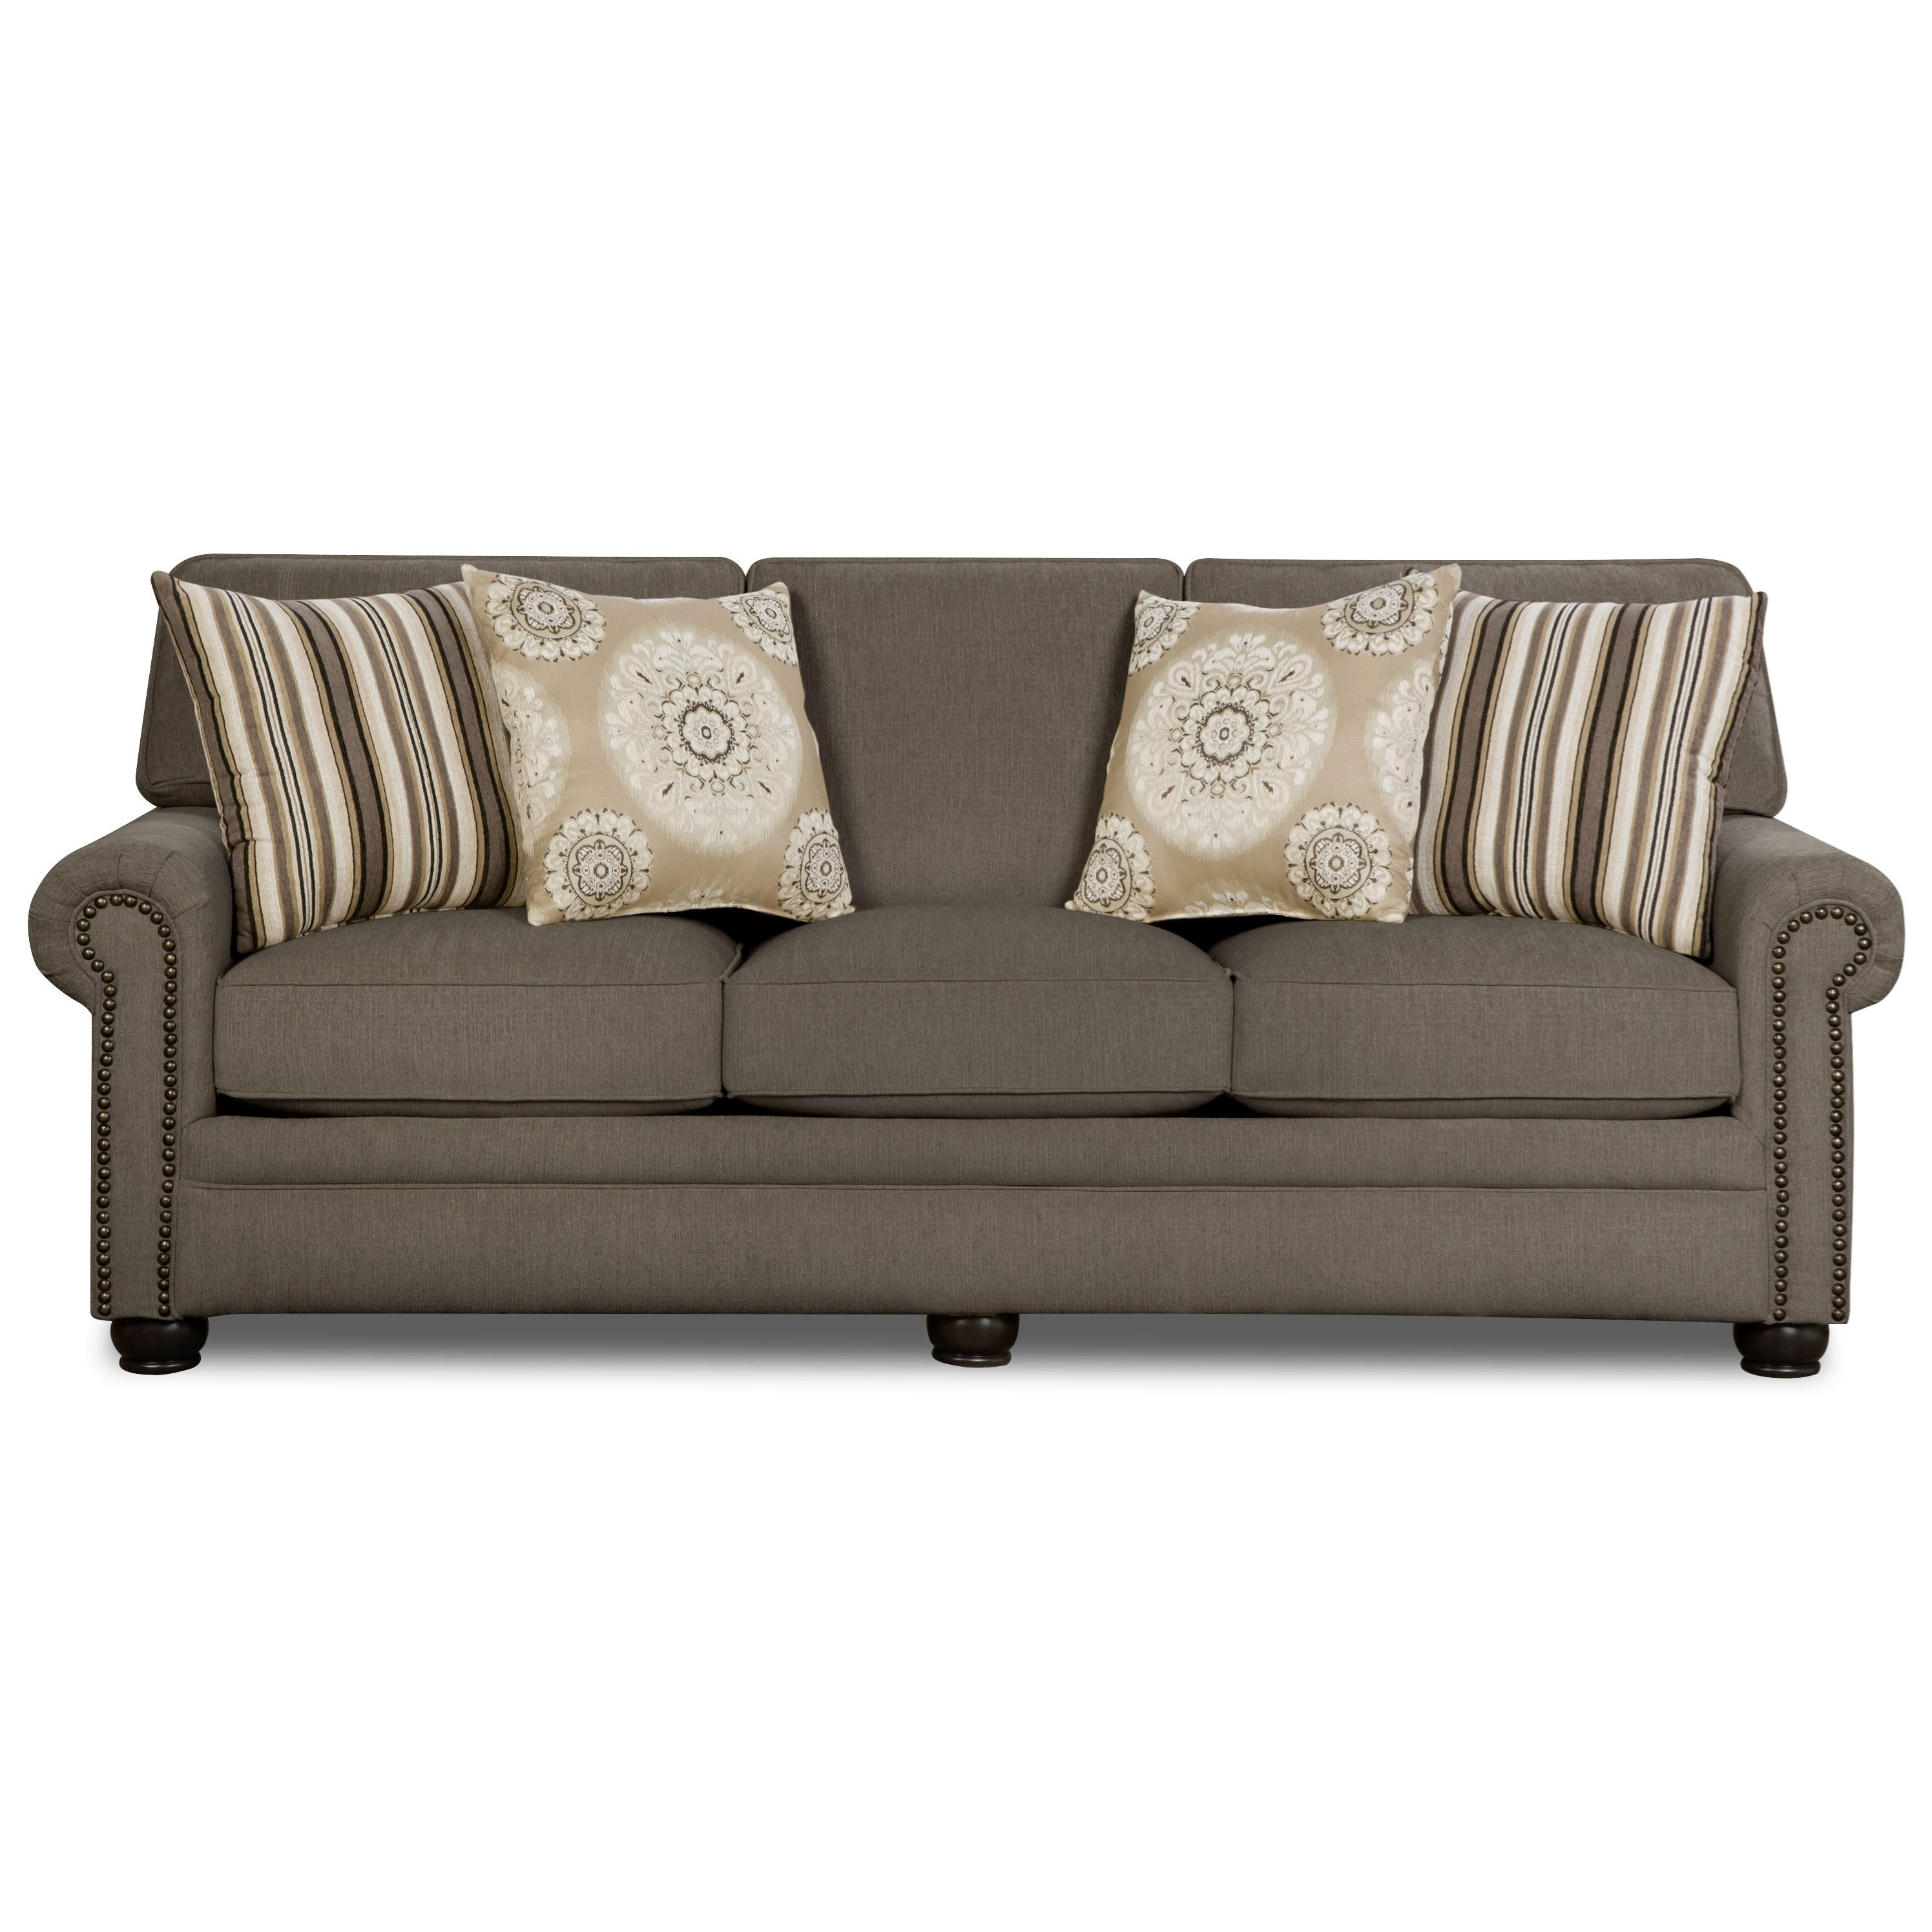 Corinthian 97B0 Sofa - Item Number: FG97B3-FAIRLEY-DARKSTONE